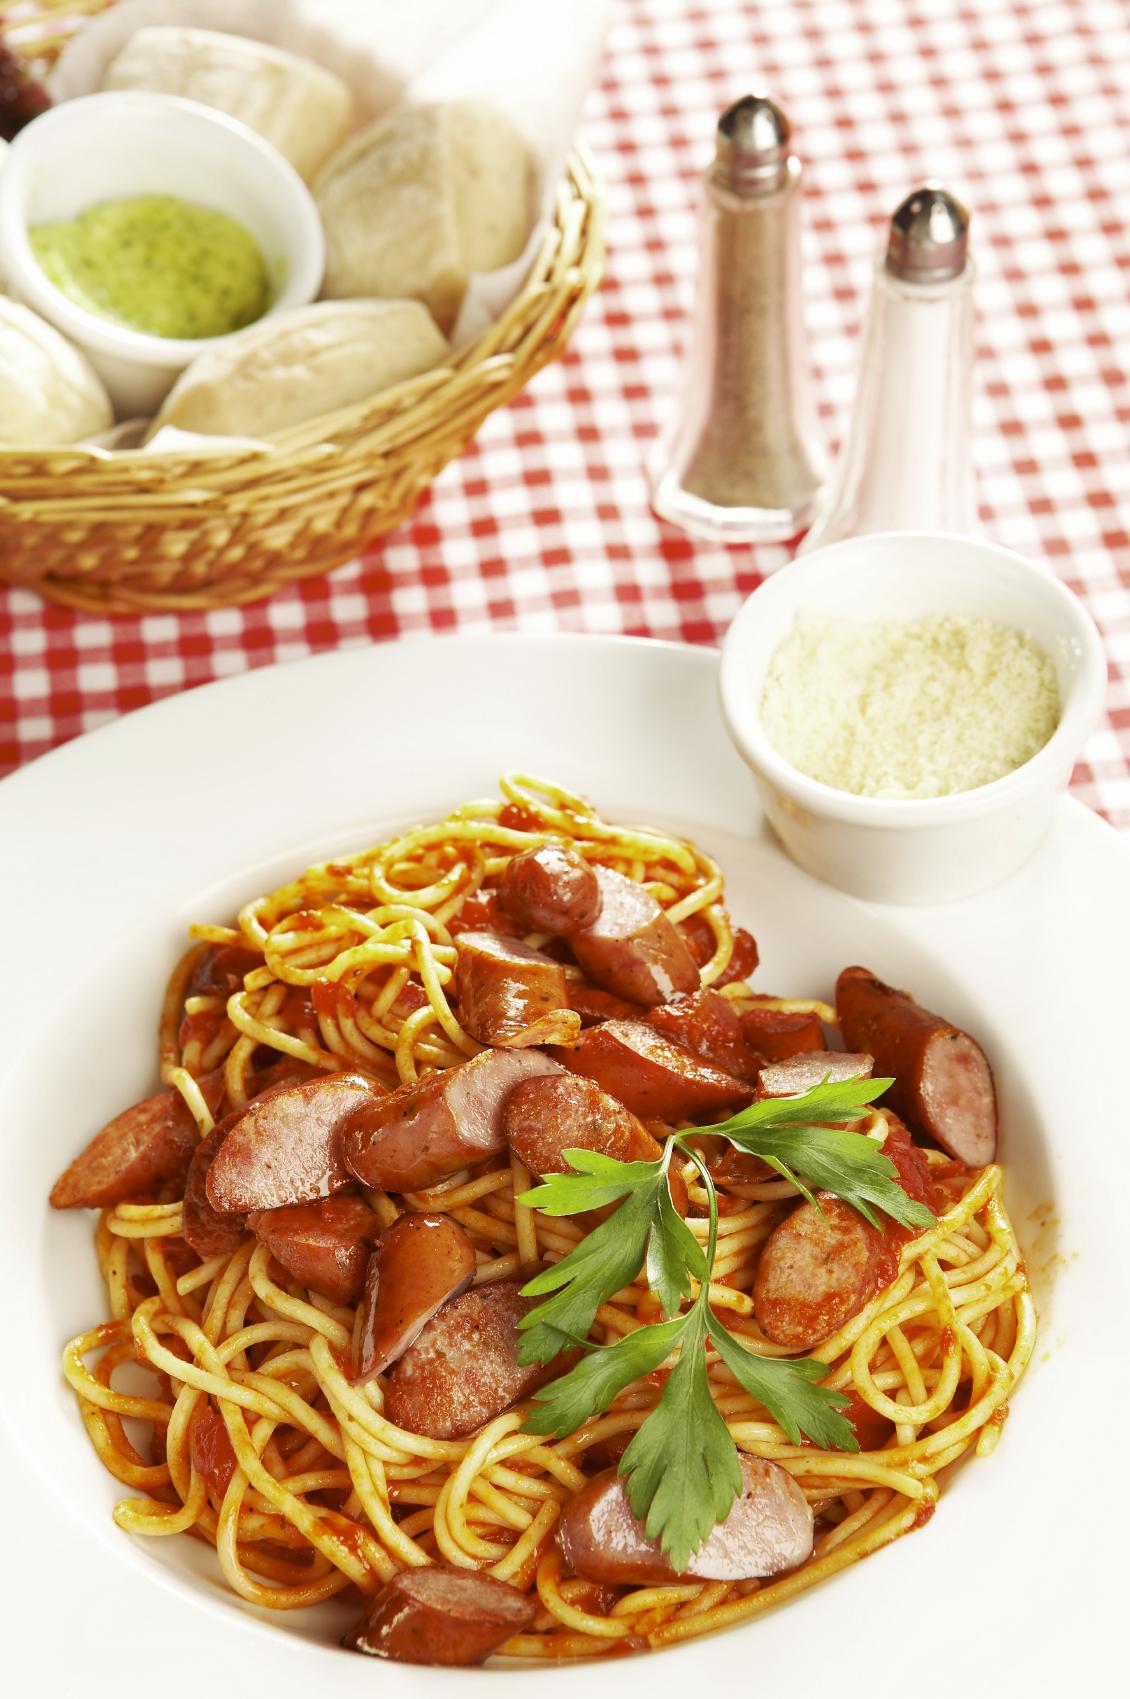 Espaguetis al tomate con salchicha parrillera